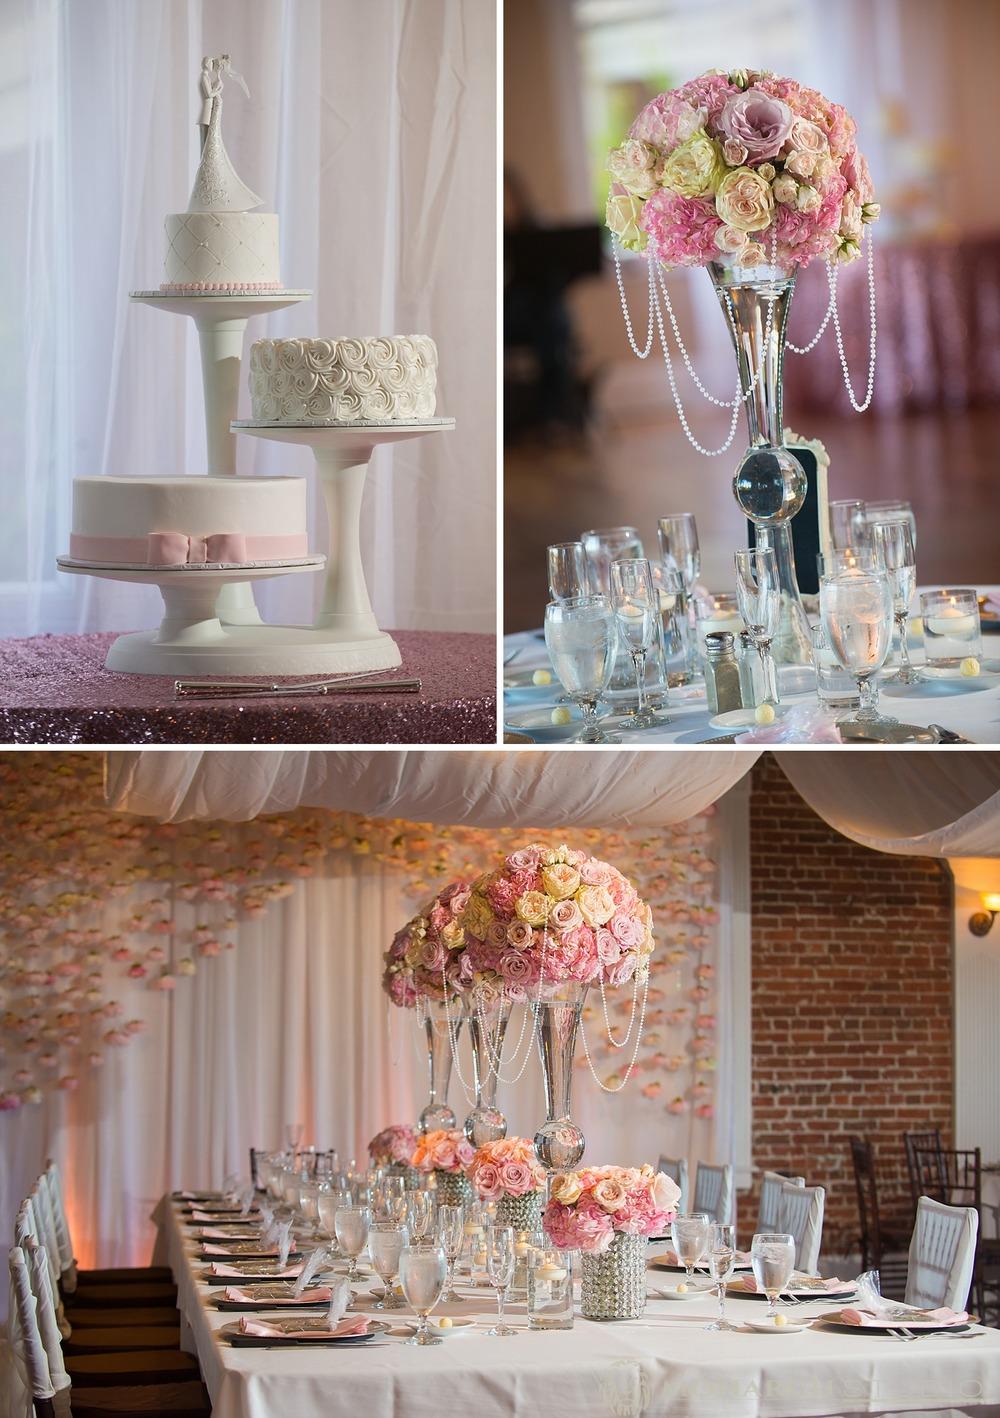 White-Room-Wedding-Venue-St-Augustine-Florida_0025.jpg